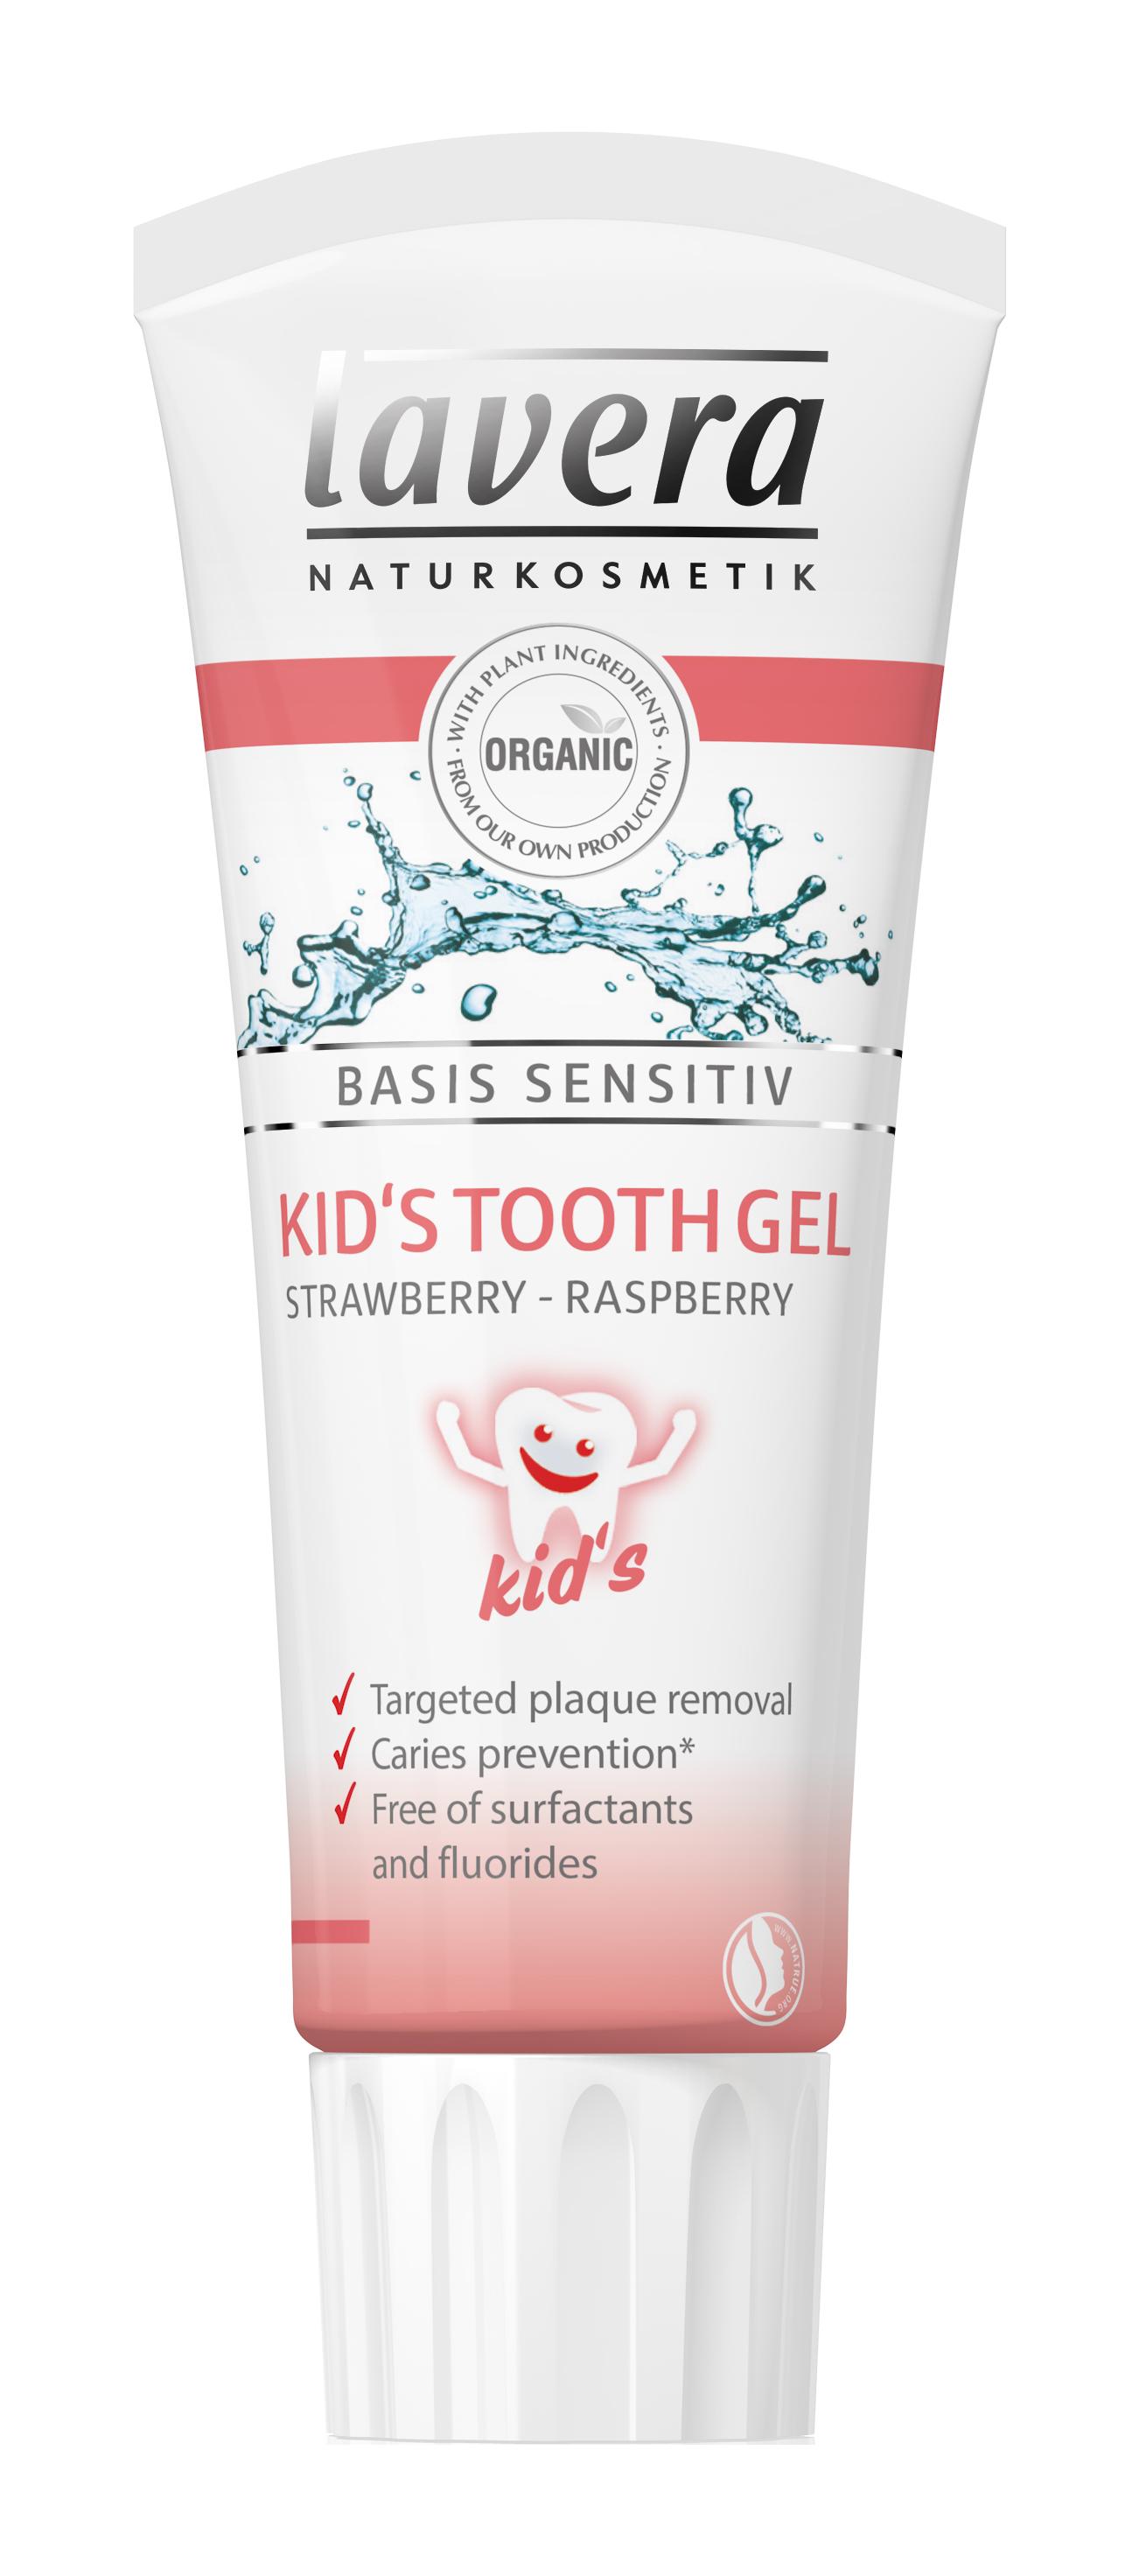 Lavera Basis Kids Tooth Gel Strawberry Raspberry 75ml Earthrose Jack N Jill Toothpaste 50g